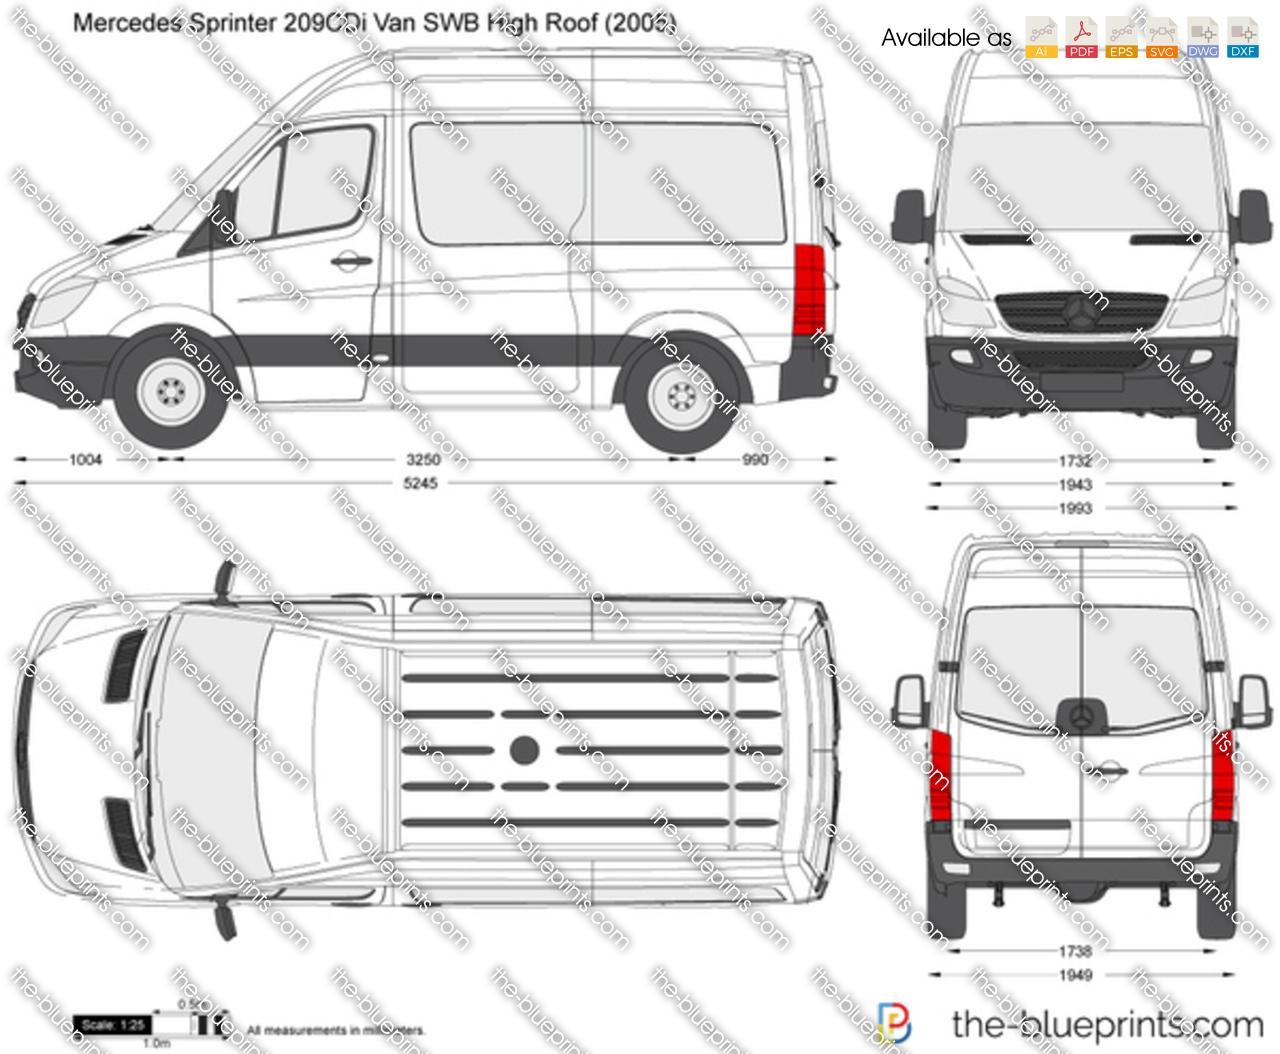 Mercedes Benz Sprinter 209cdi Van Swb High Roof Vector Drawing